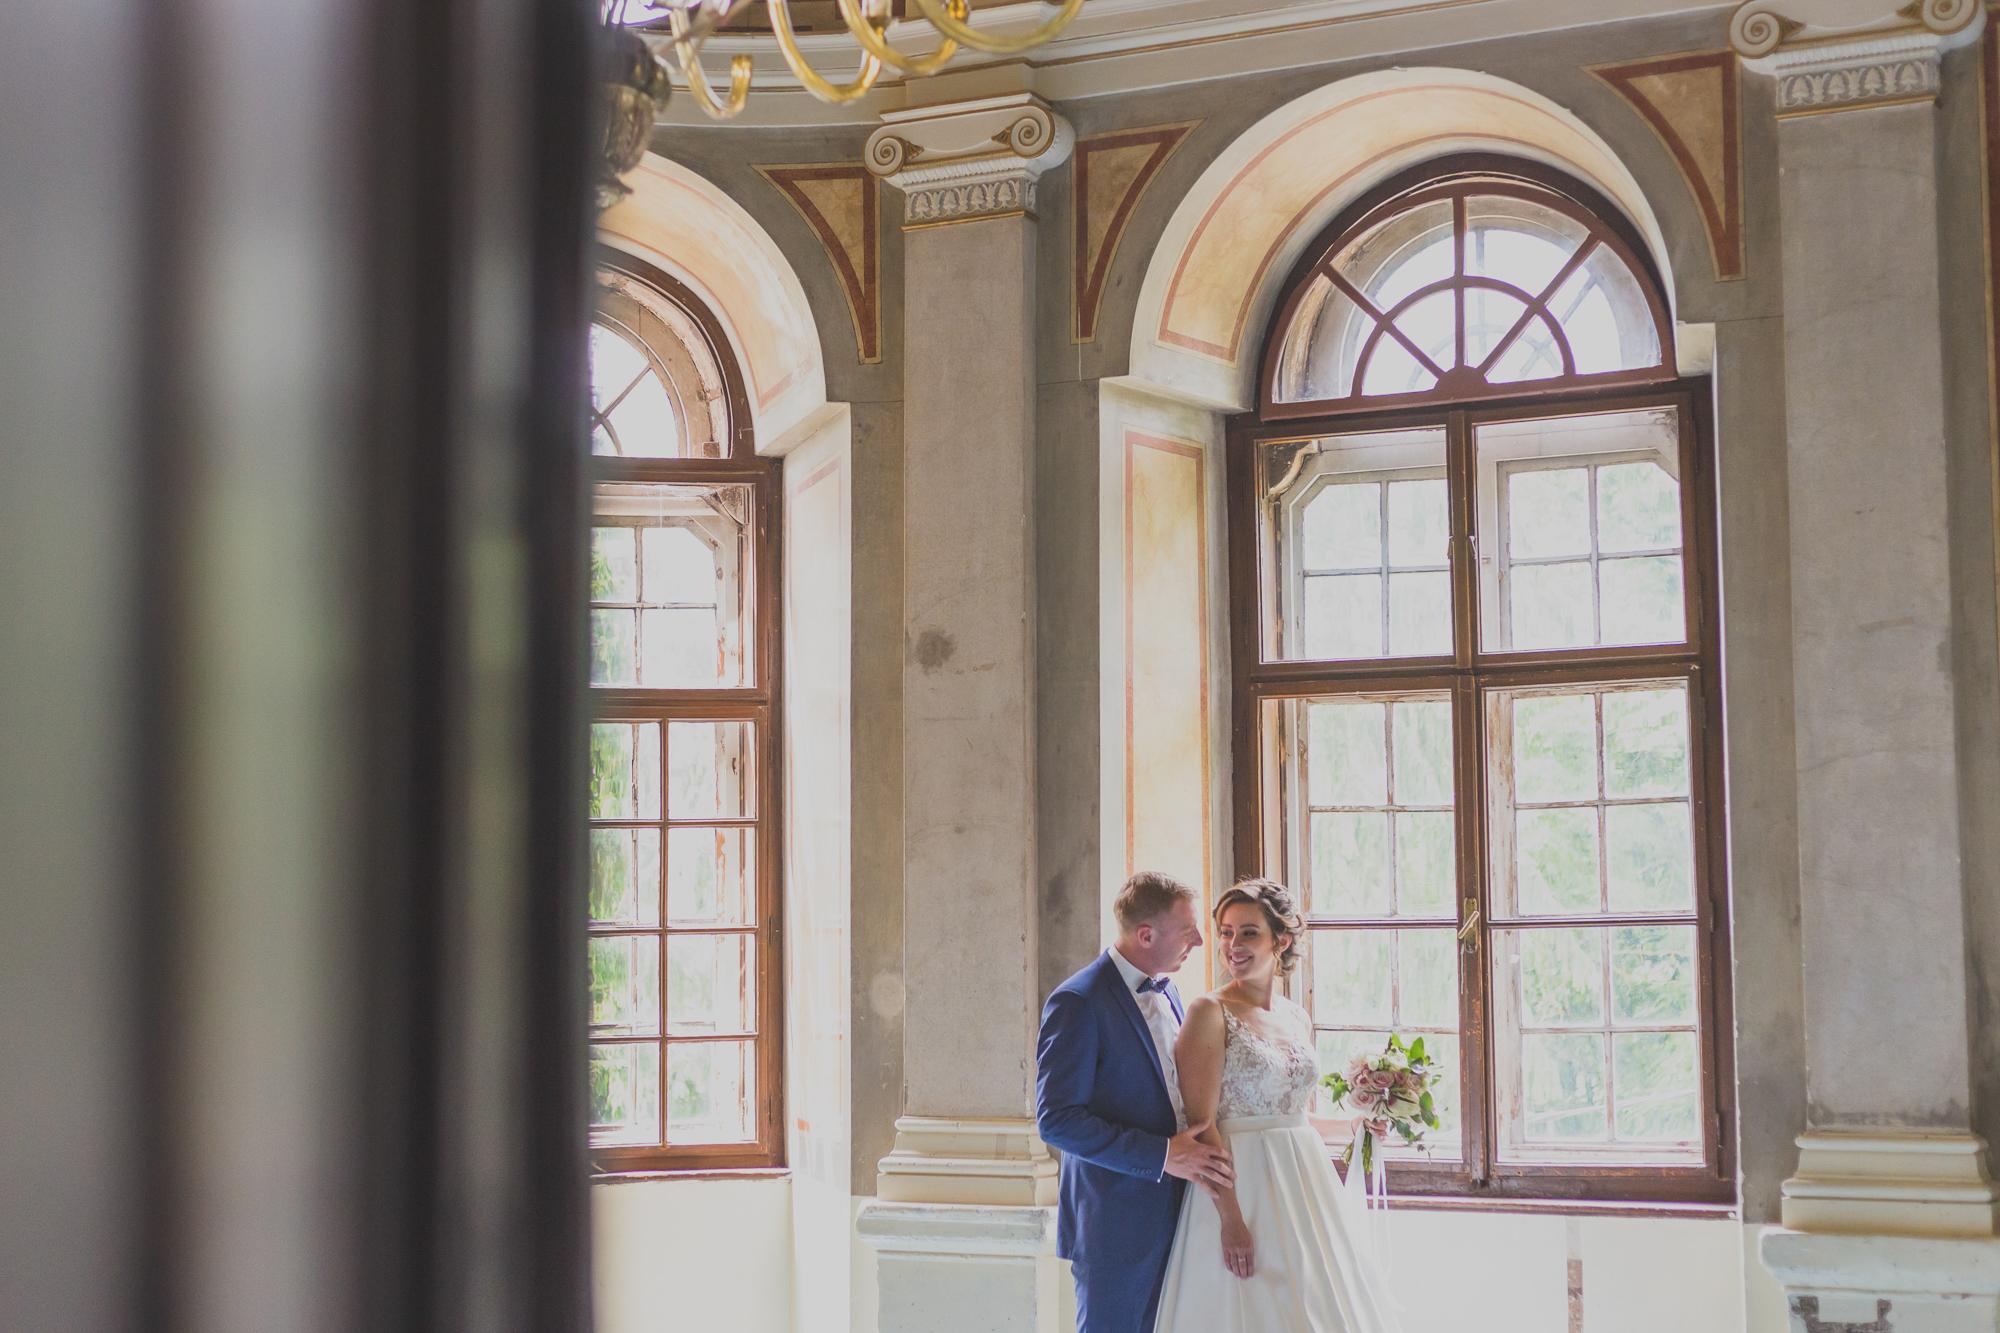 fotografie de nunta, miri la castel telki gornesti, cuplu in fata geamului, zambind, casdru larg cu interior castel